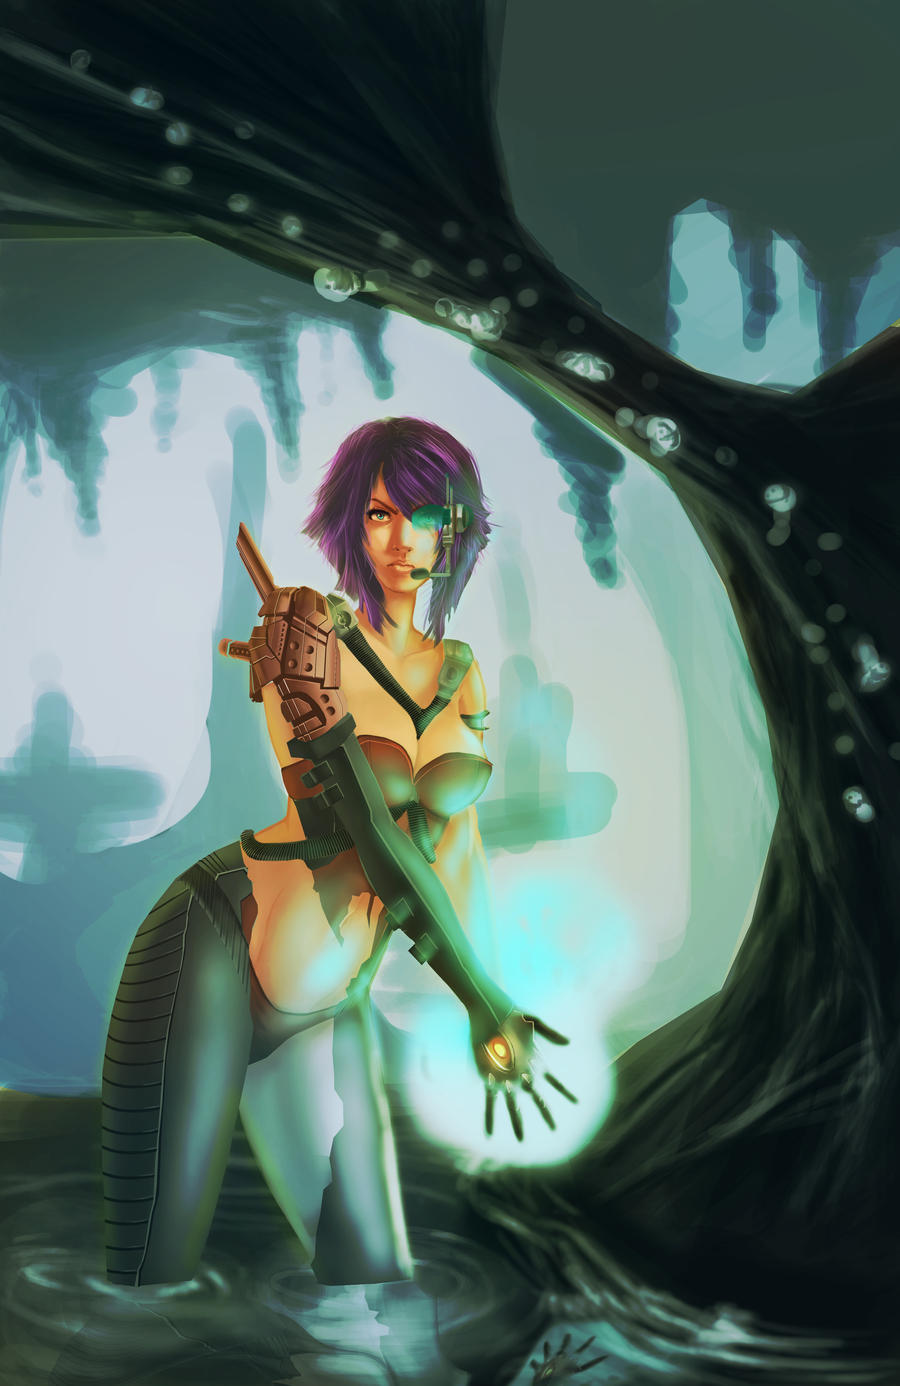 Sci-fi_Fantasy by novekai